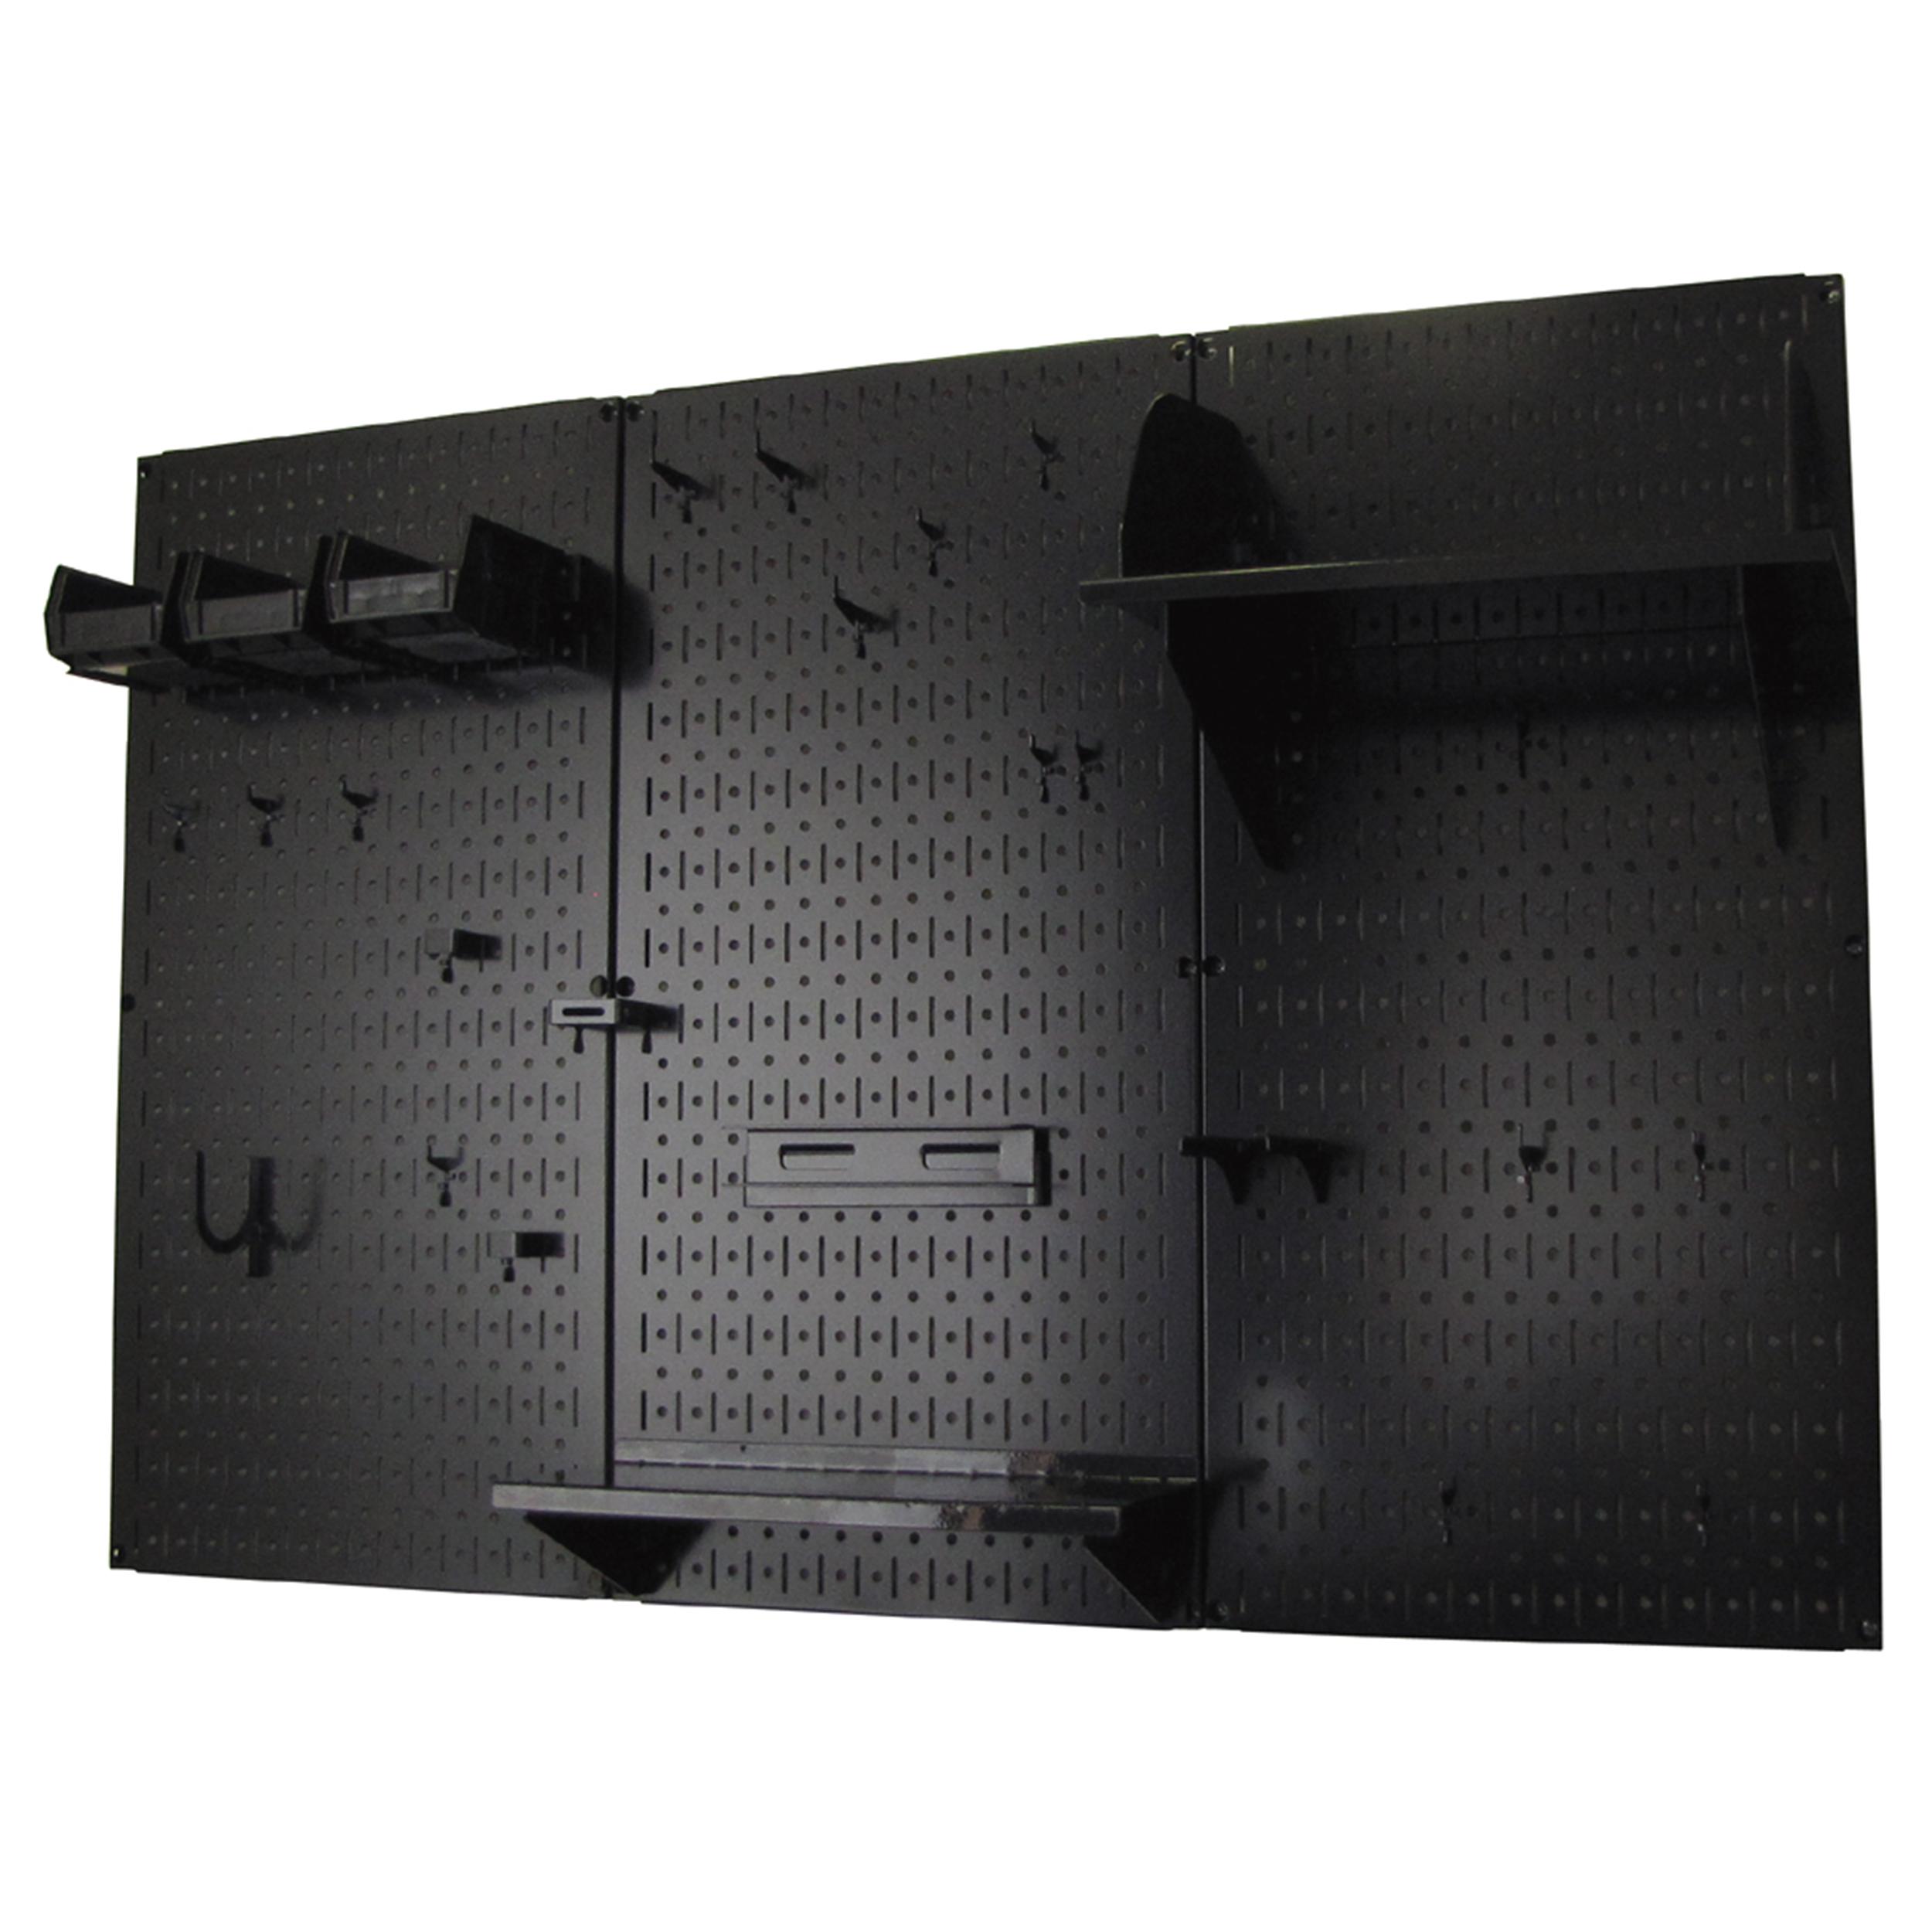 4' Metal Pegboard Standard Tool Storage Kit - Black Toolboard & Black Accessories